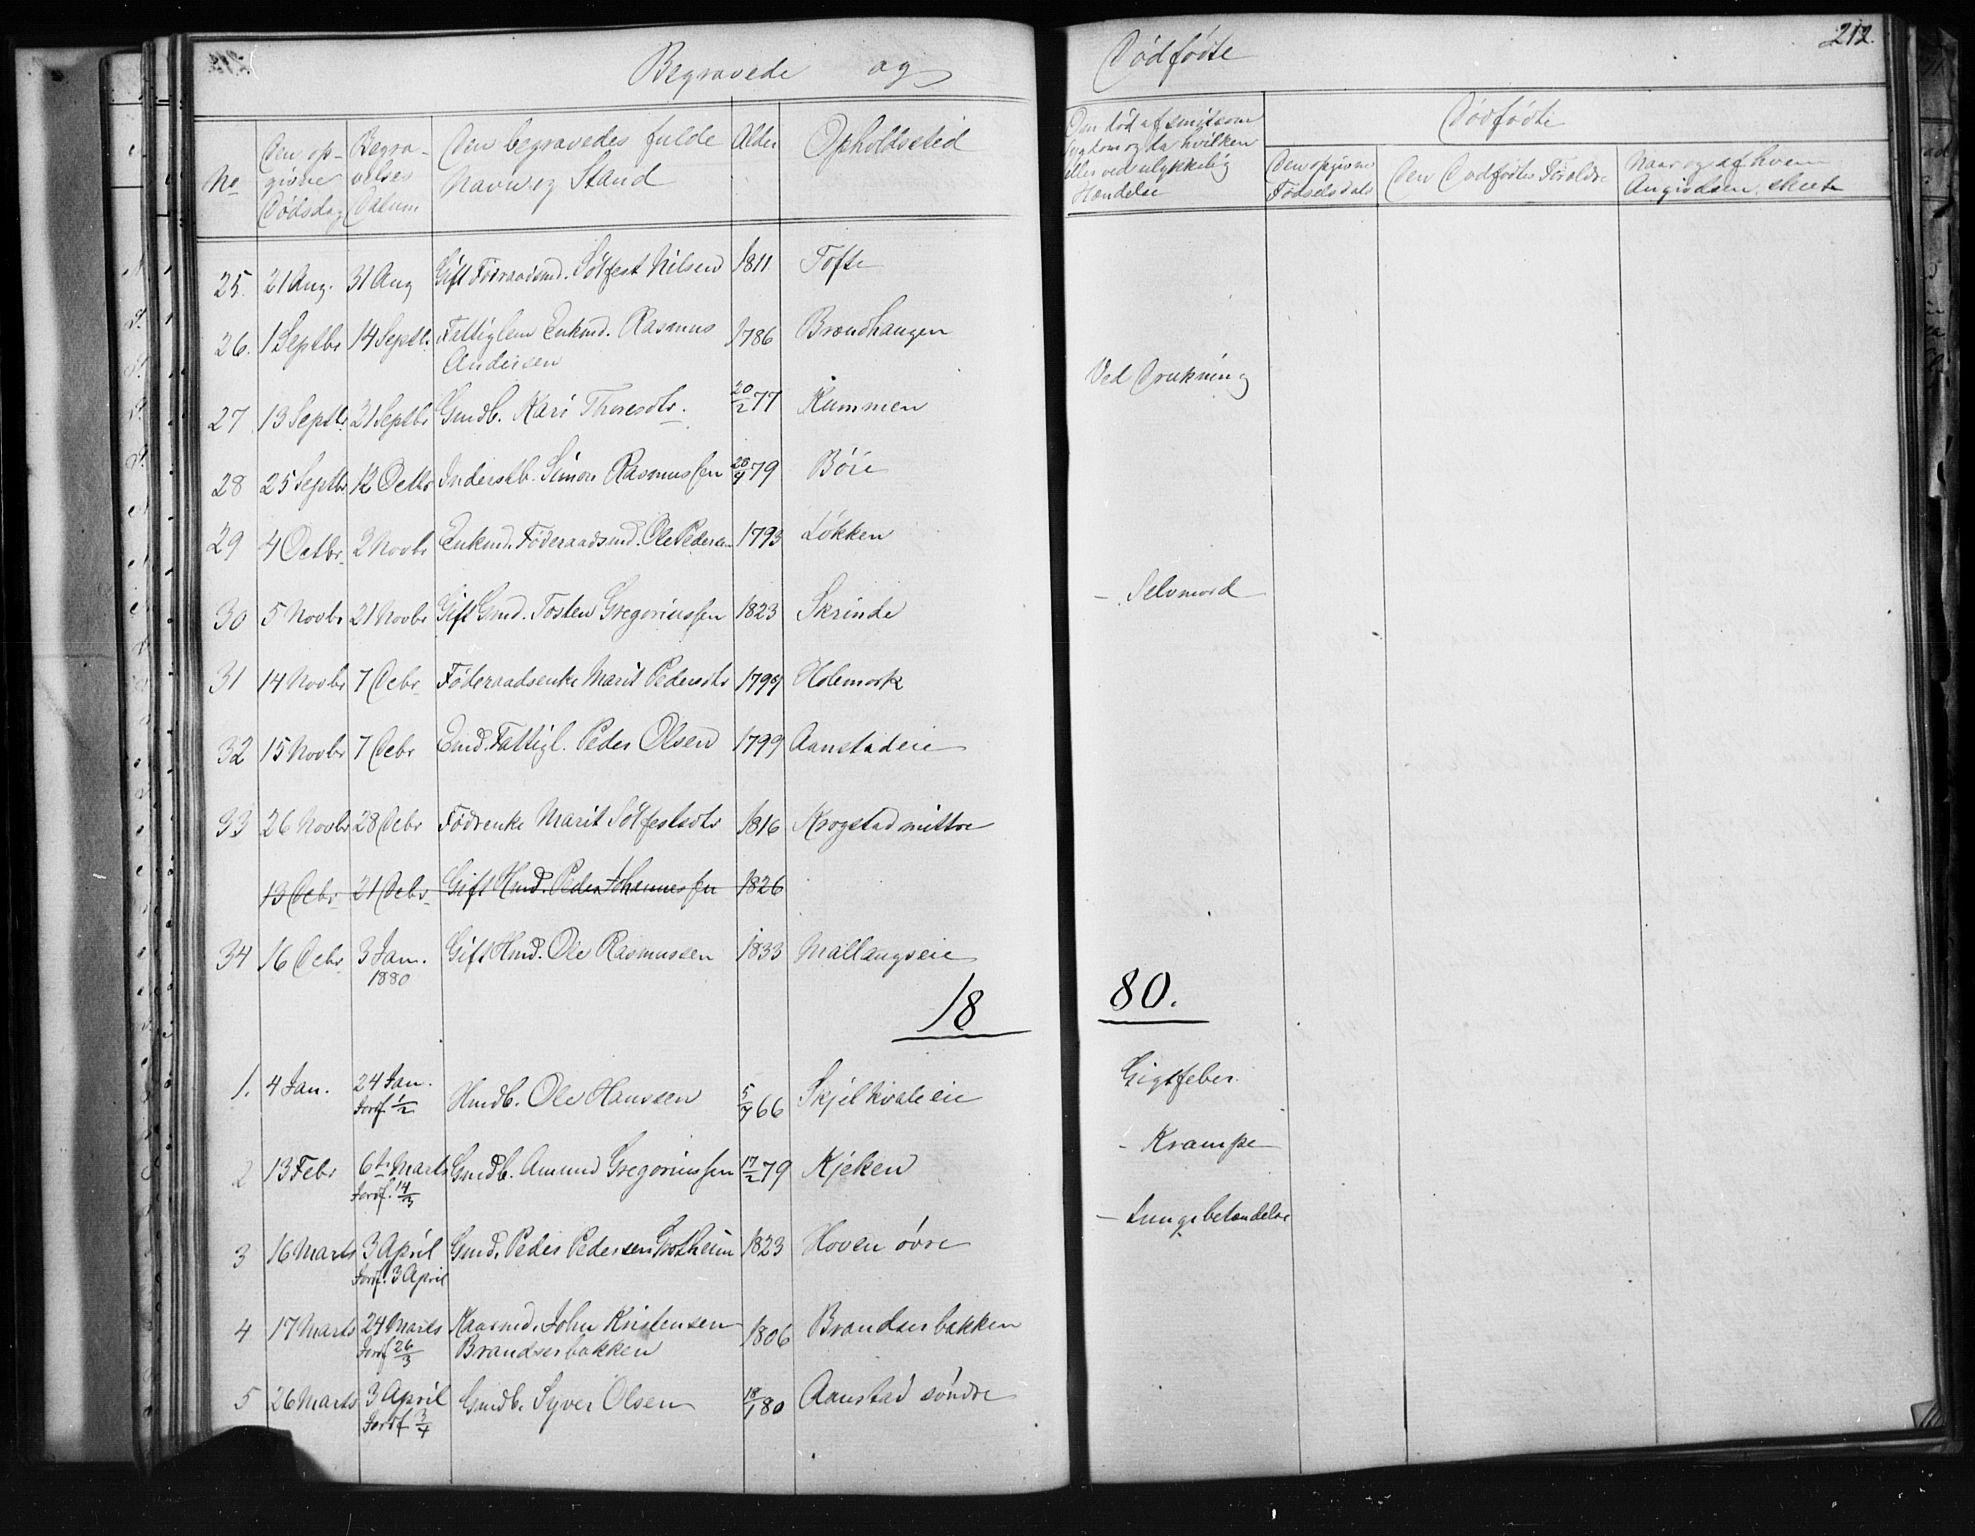 SAH, Skjåk prestekontor, Klokkerbok nr. 1, 1865-1893, s. 212